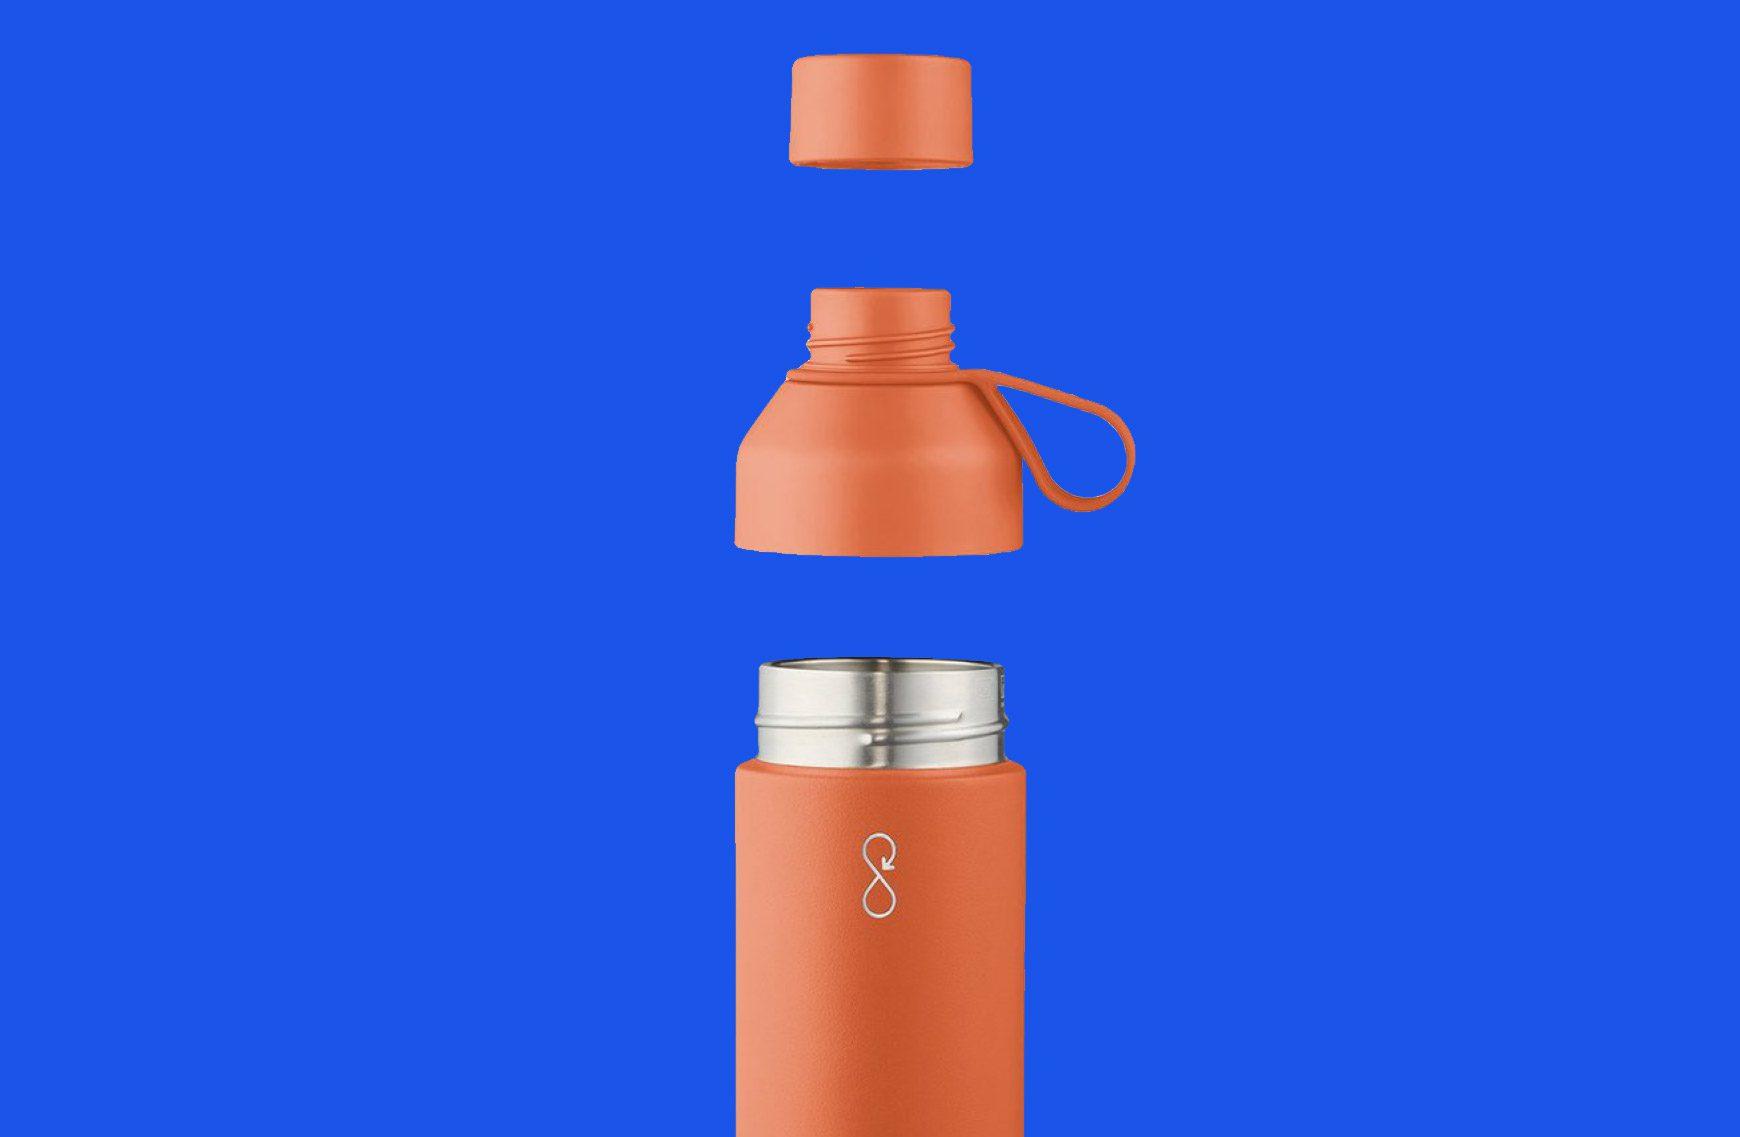 Image of branded spill proof bottle against blue background